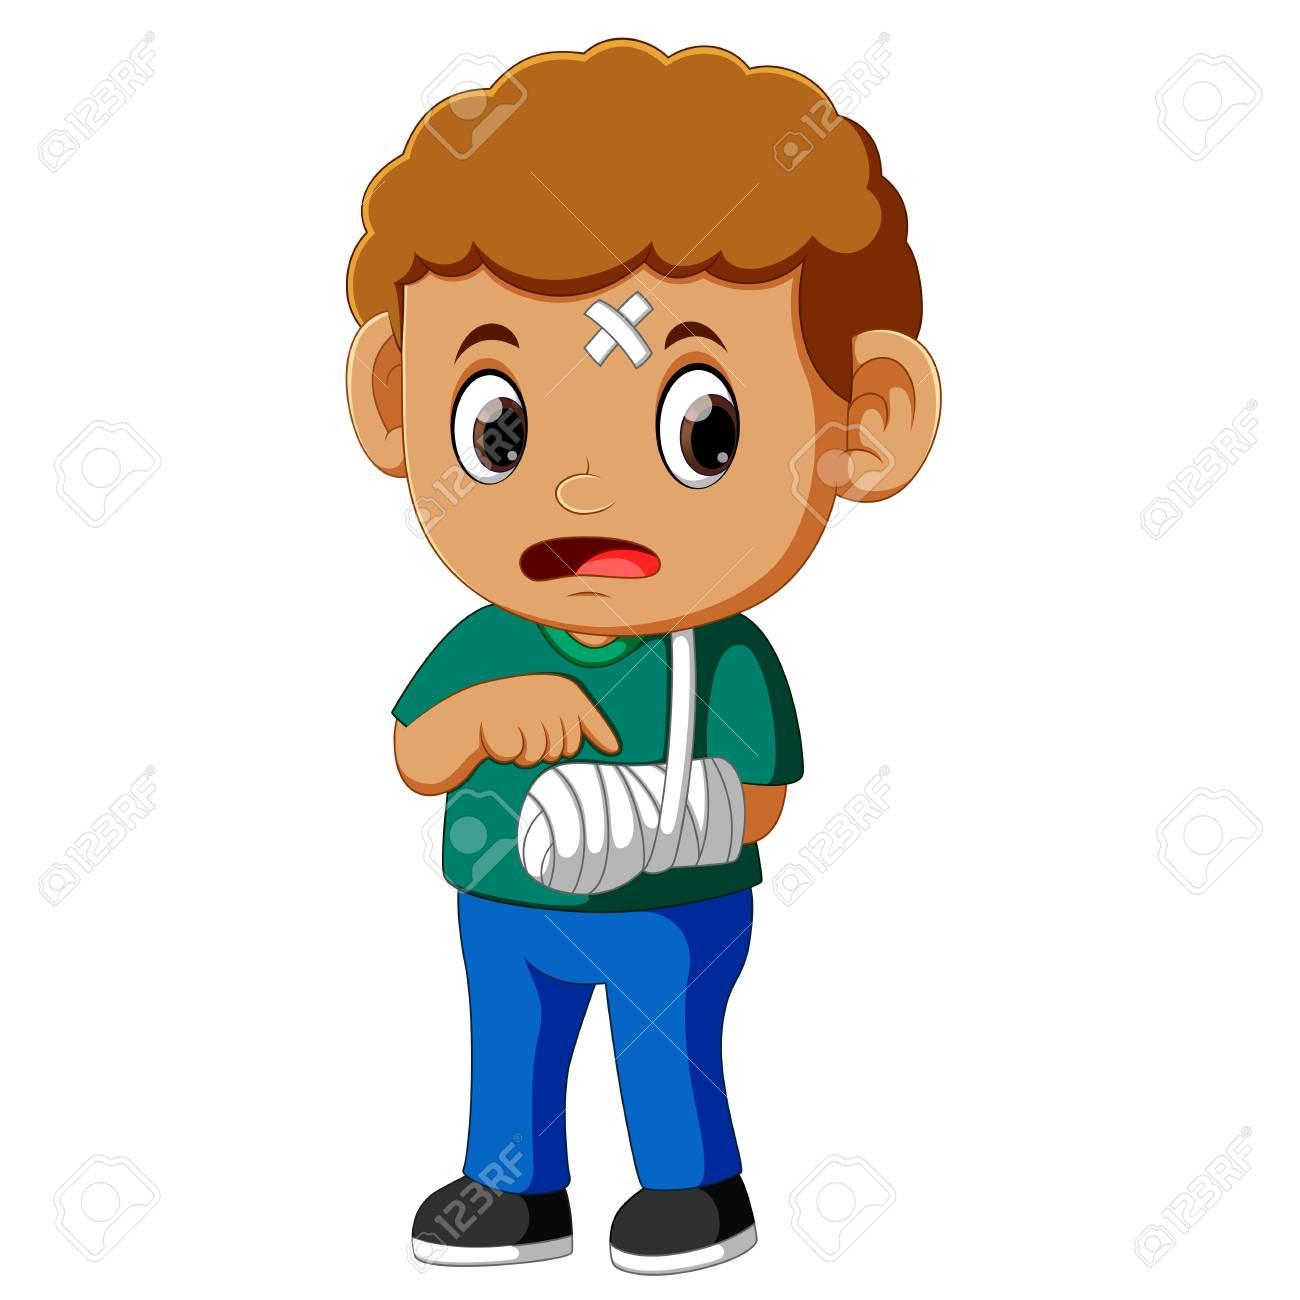 boy showing a broken arm.